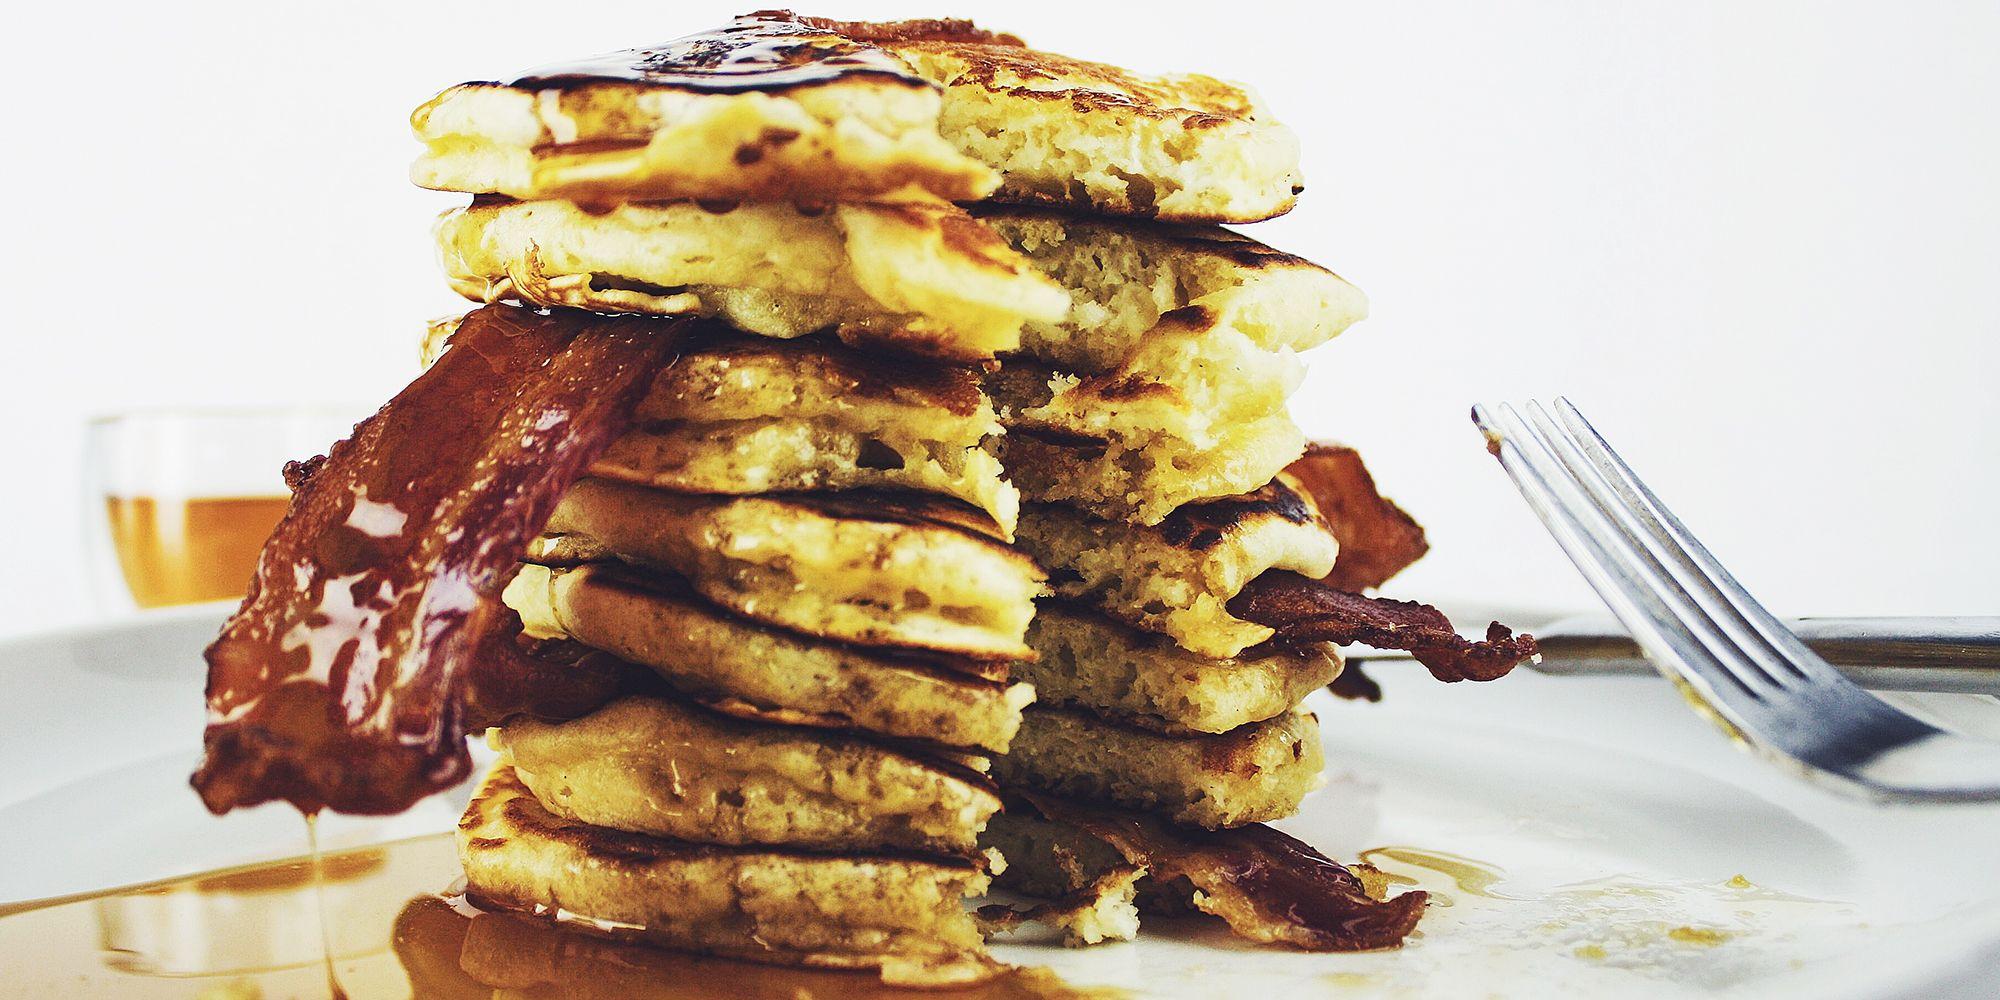 How to Make Perfect Pancakes Best Homemade Pancake Recipe